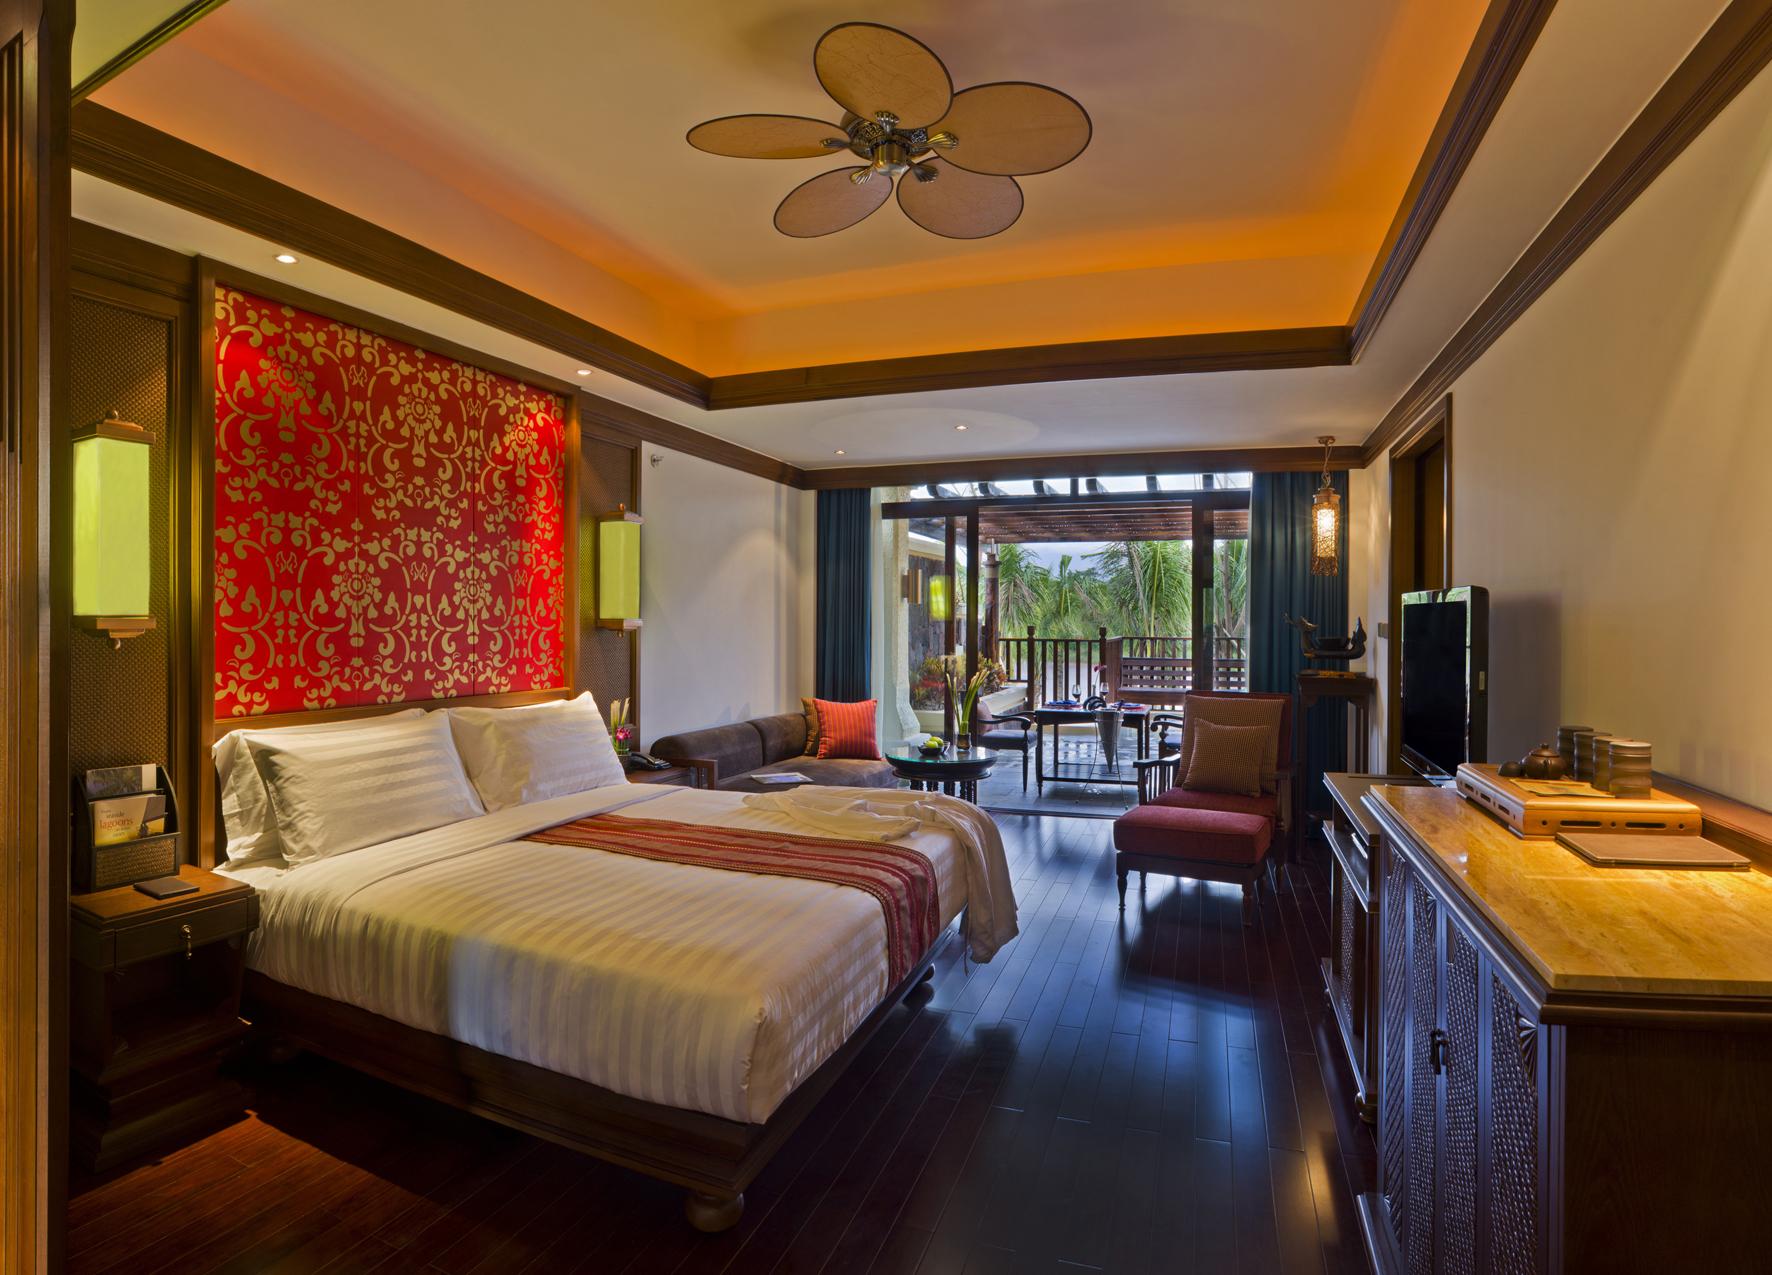 SOCIALIGHT ANANTARA XISHUANGBANNA 0940 7 guest-room